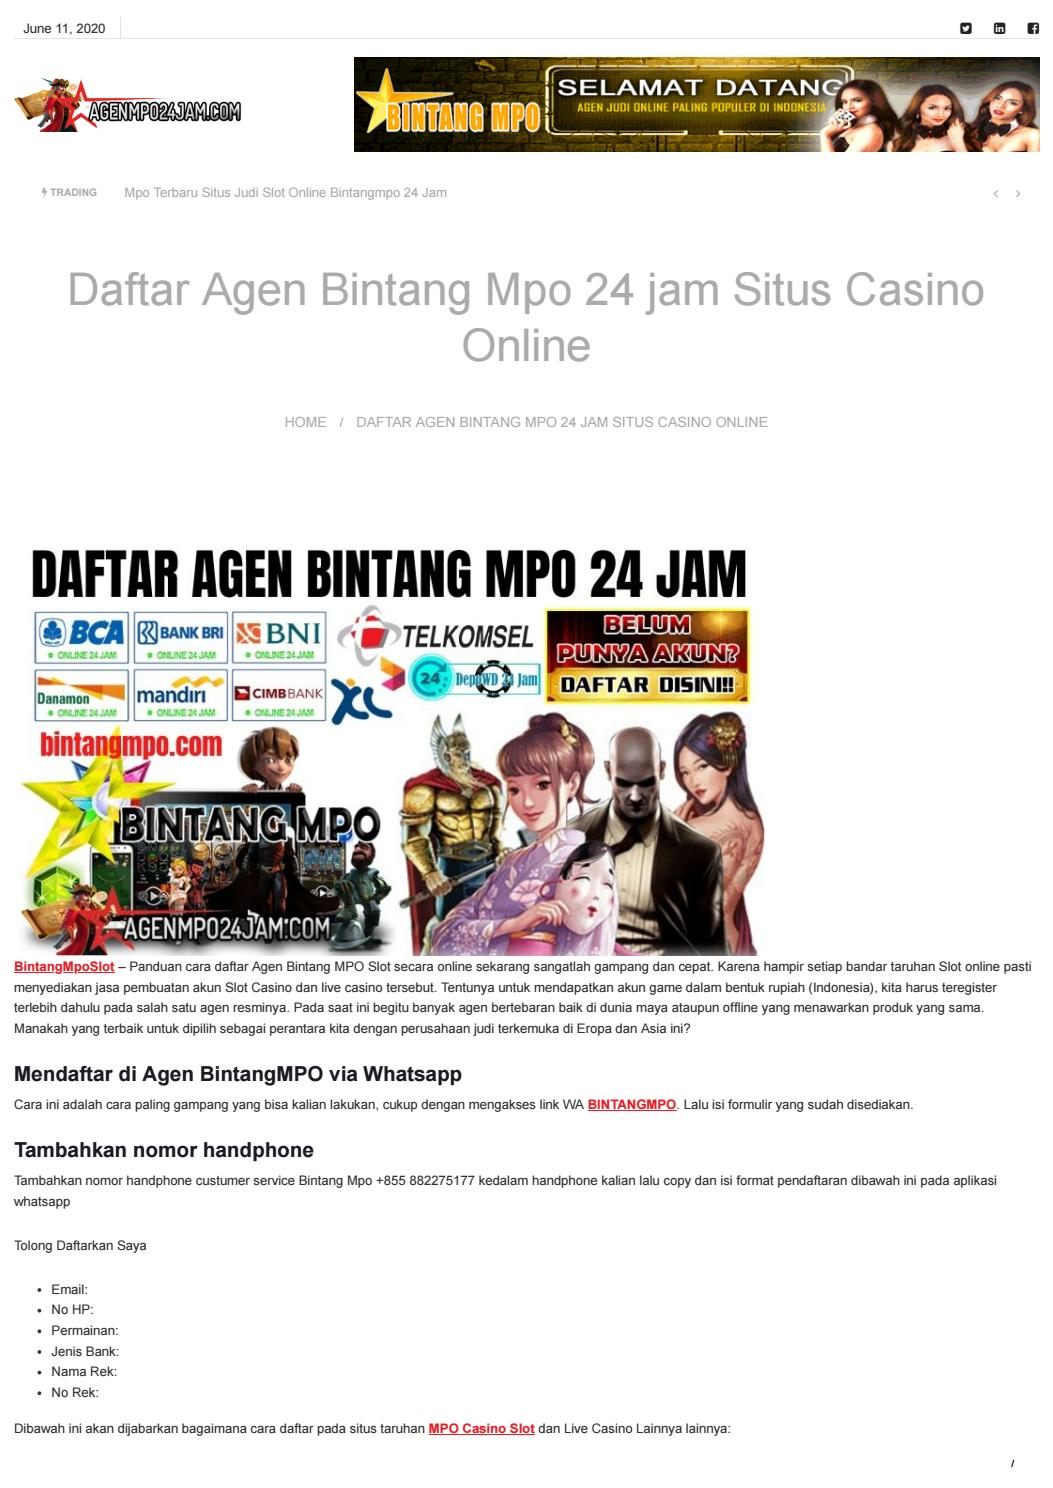 Daftar Akun Mpo Slot Online 24 Jam Deposit Via Pulsa By Super Mpo Slot Pulsa Online 24 Jam Issuu